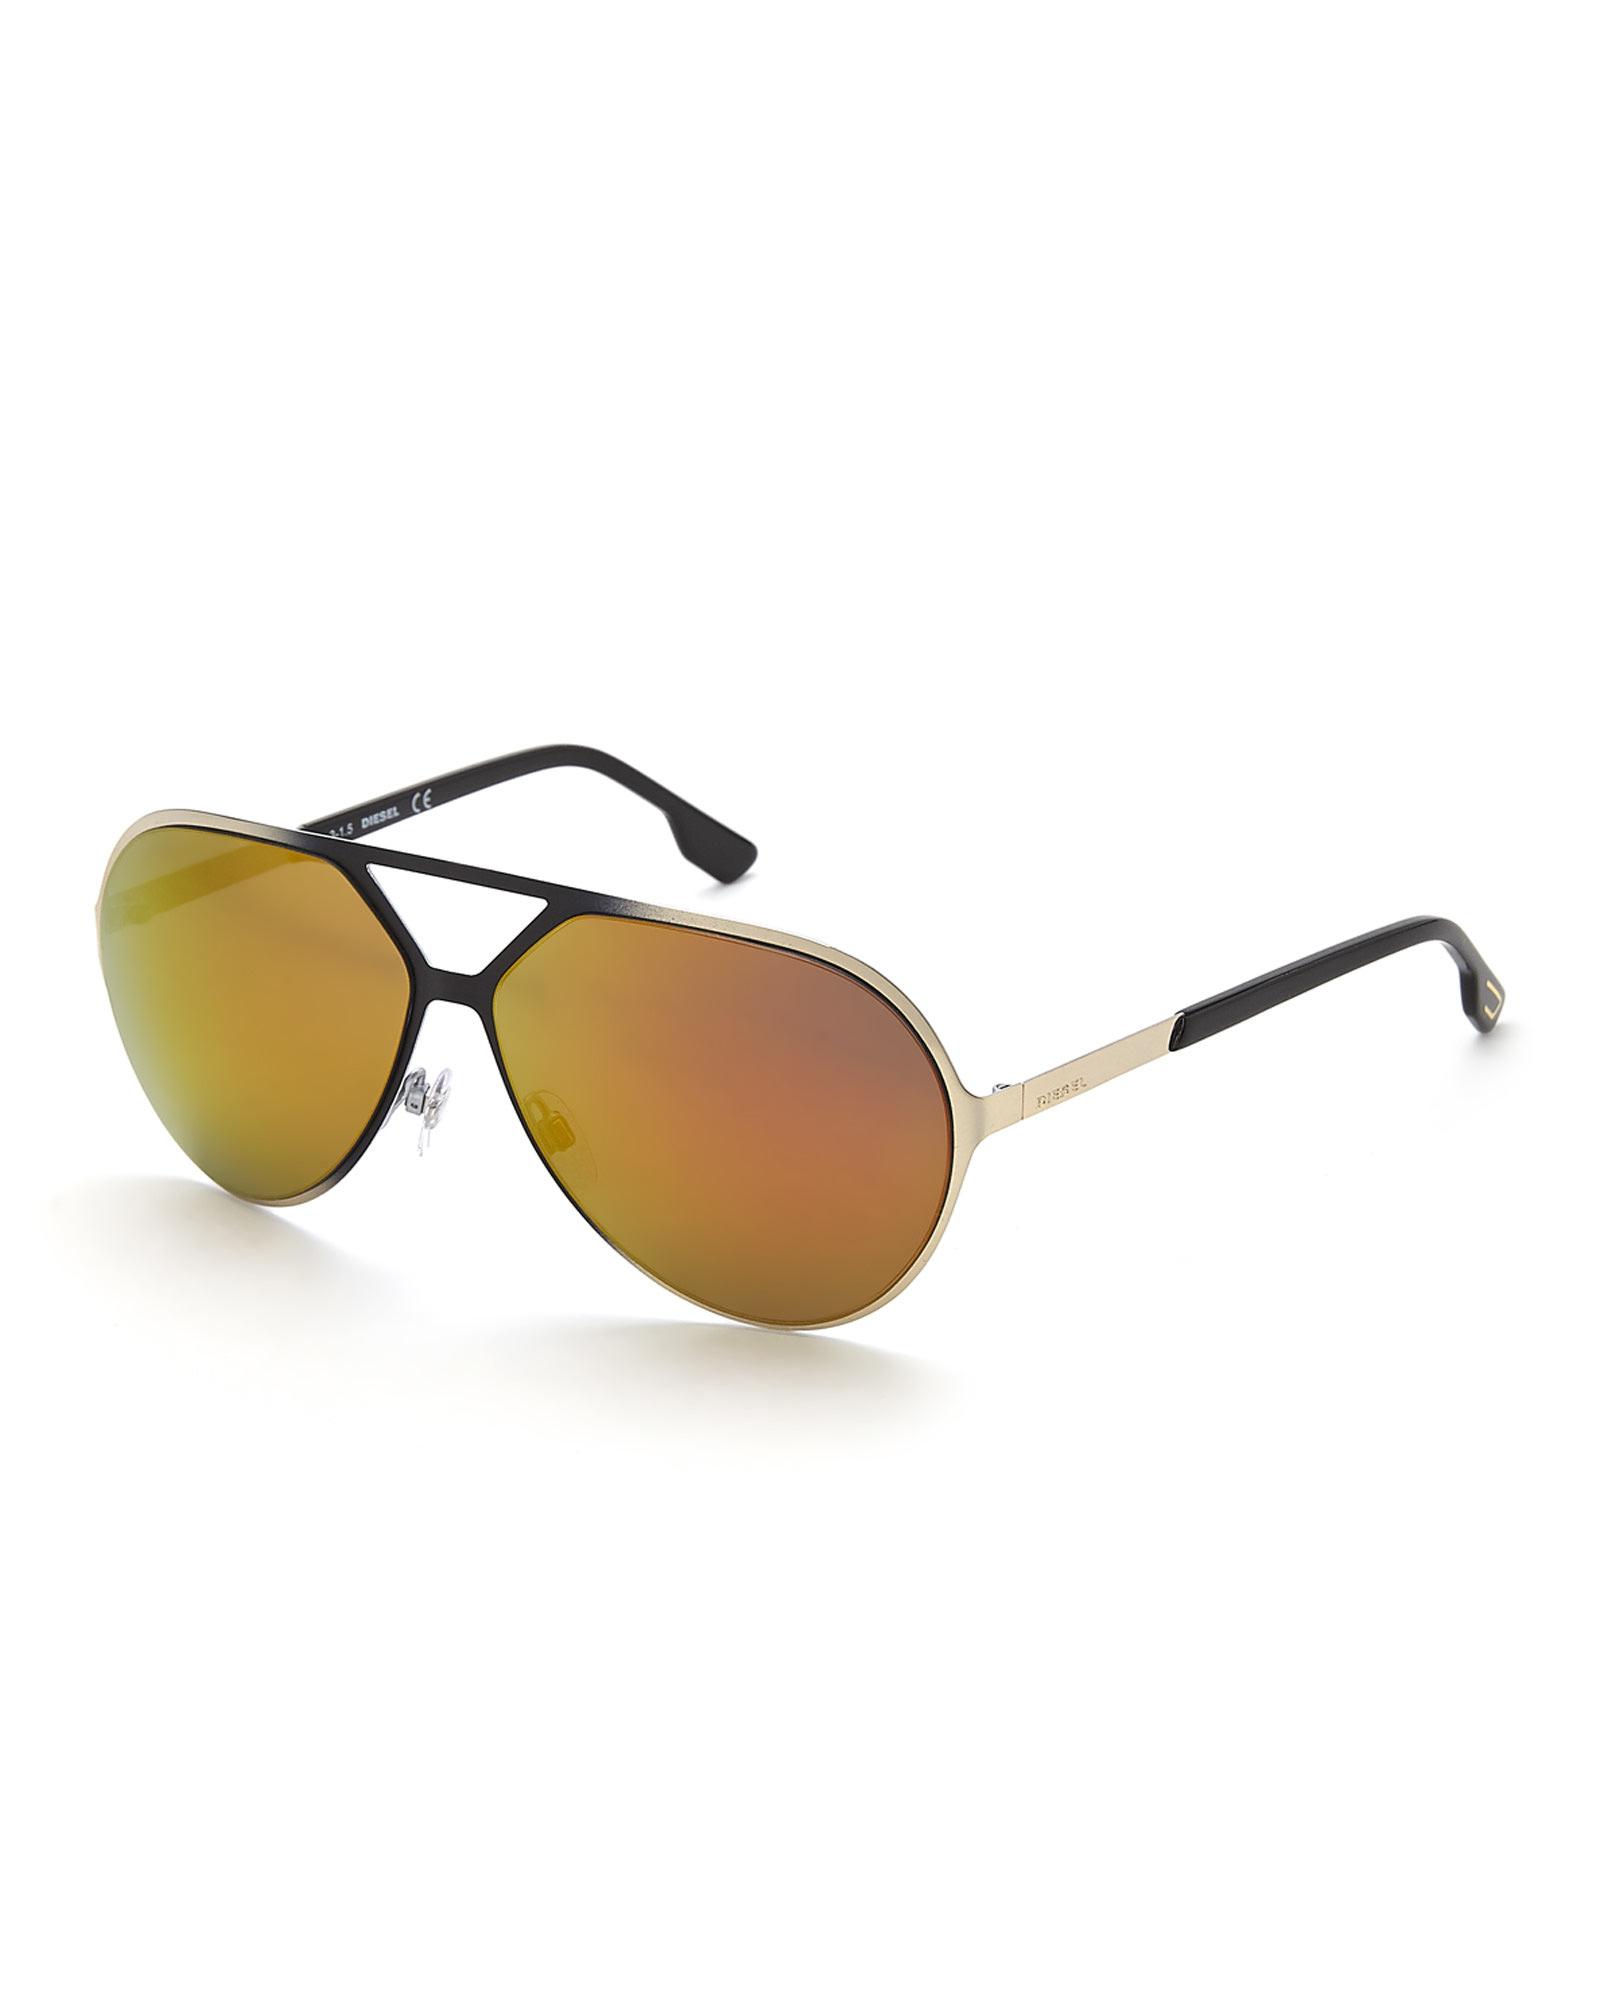 Diesel Light Gold-Tone Dl0114 Aviator Sunglasses in ...